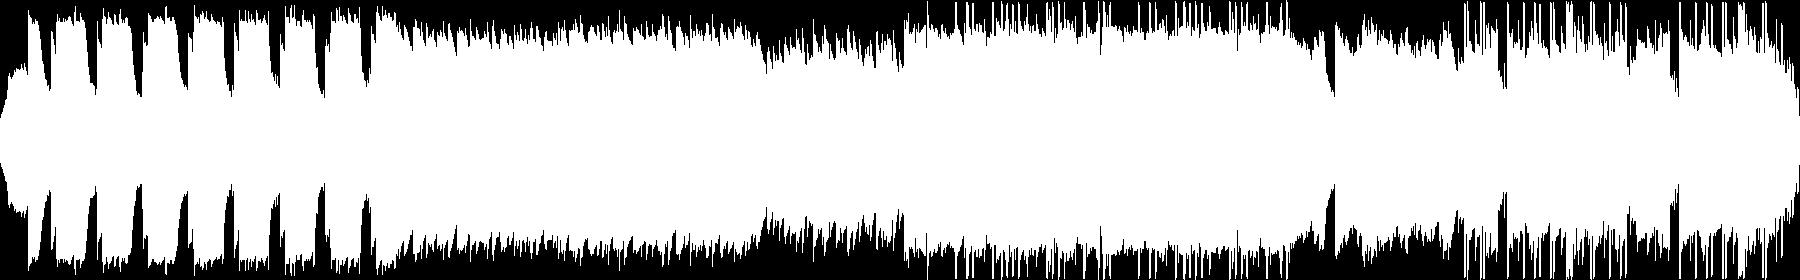 GUITARNOTE audio waveform